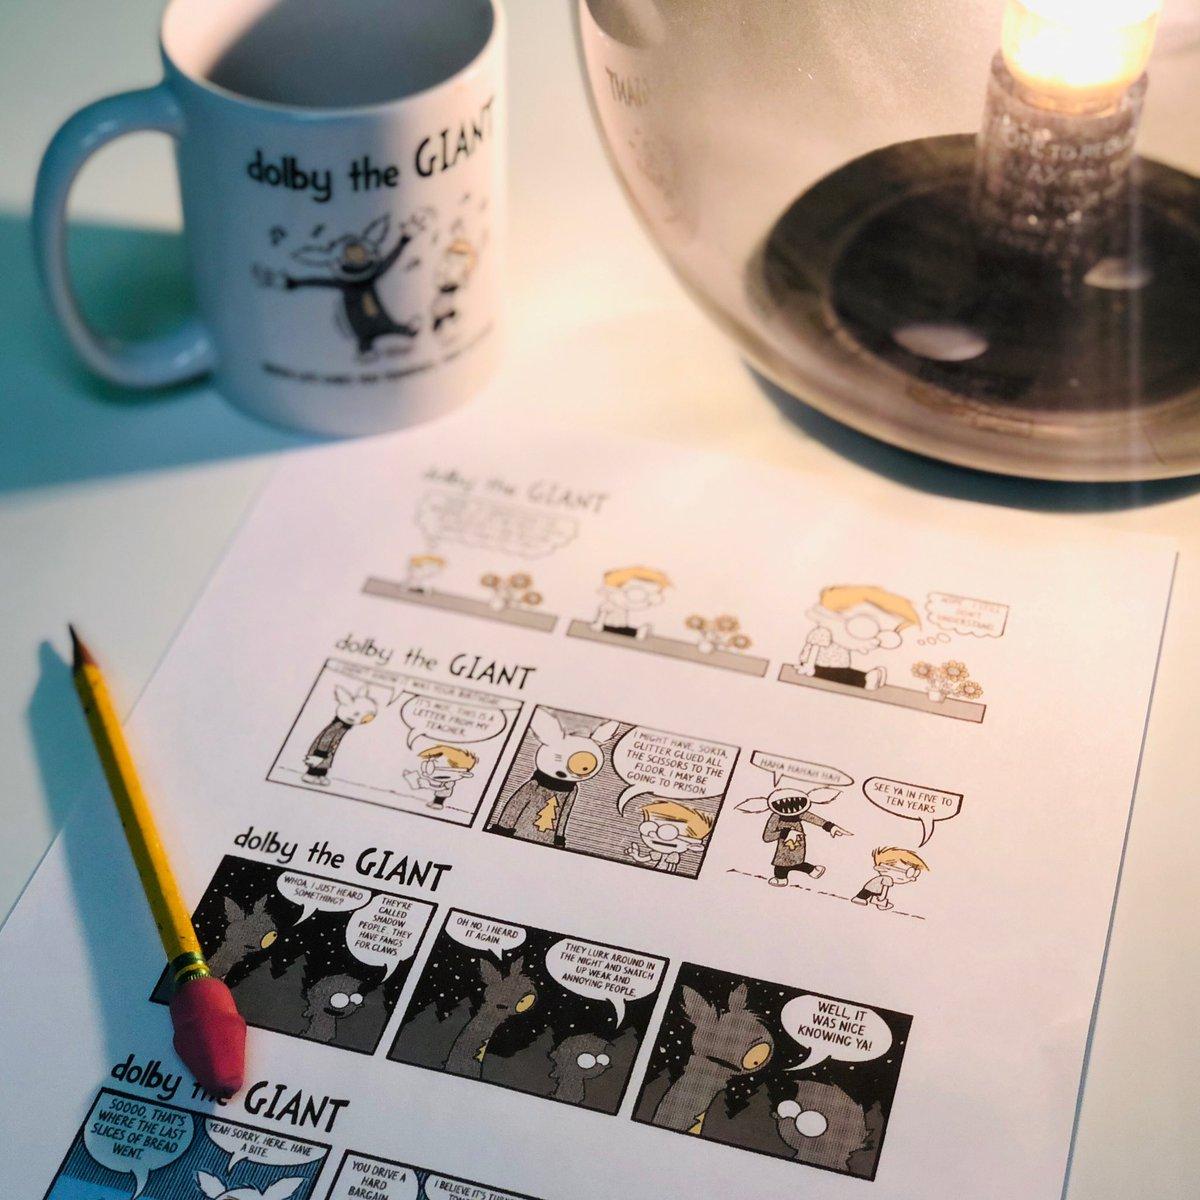 Just soaking in that new comic glow. Launching January 1st! #art #comics #comicbooks #comicstrip #humor #funny #nerd #comicbooknerd #comicbookart #doodle #cartoon #cartooning #dailycomic  #artwork #webcomic @promotecomics